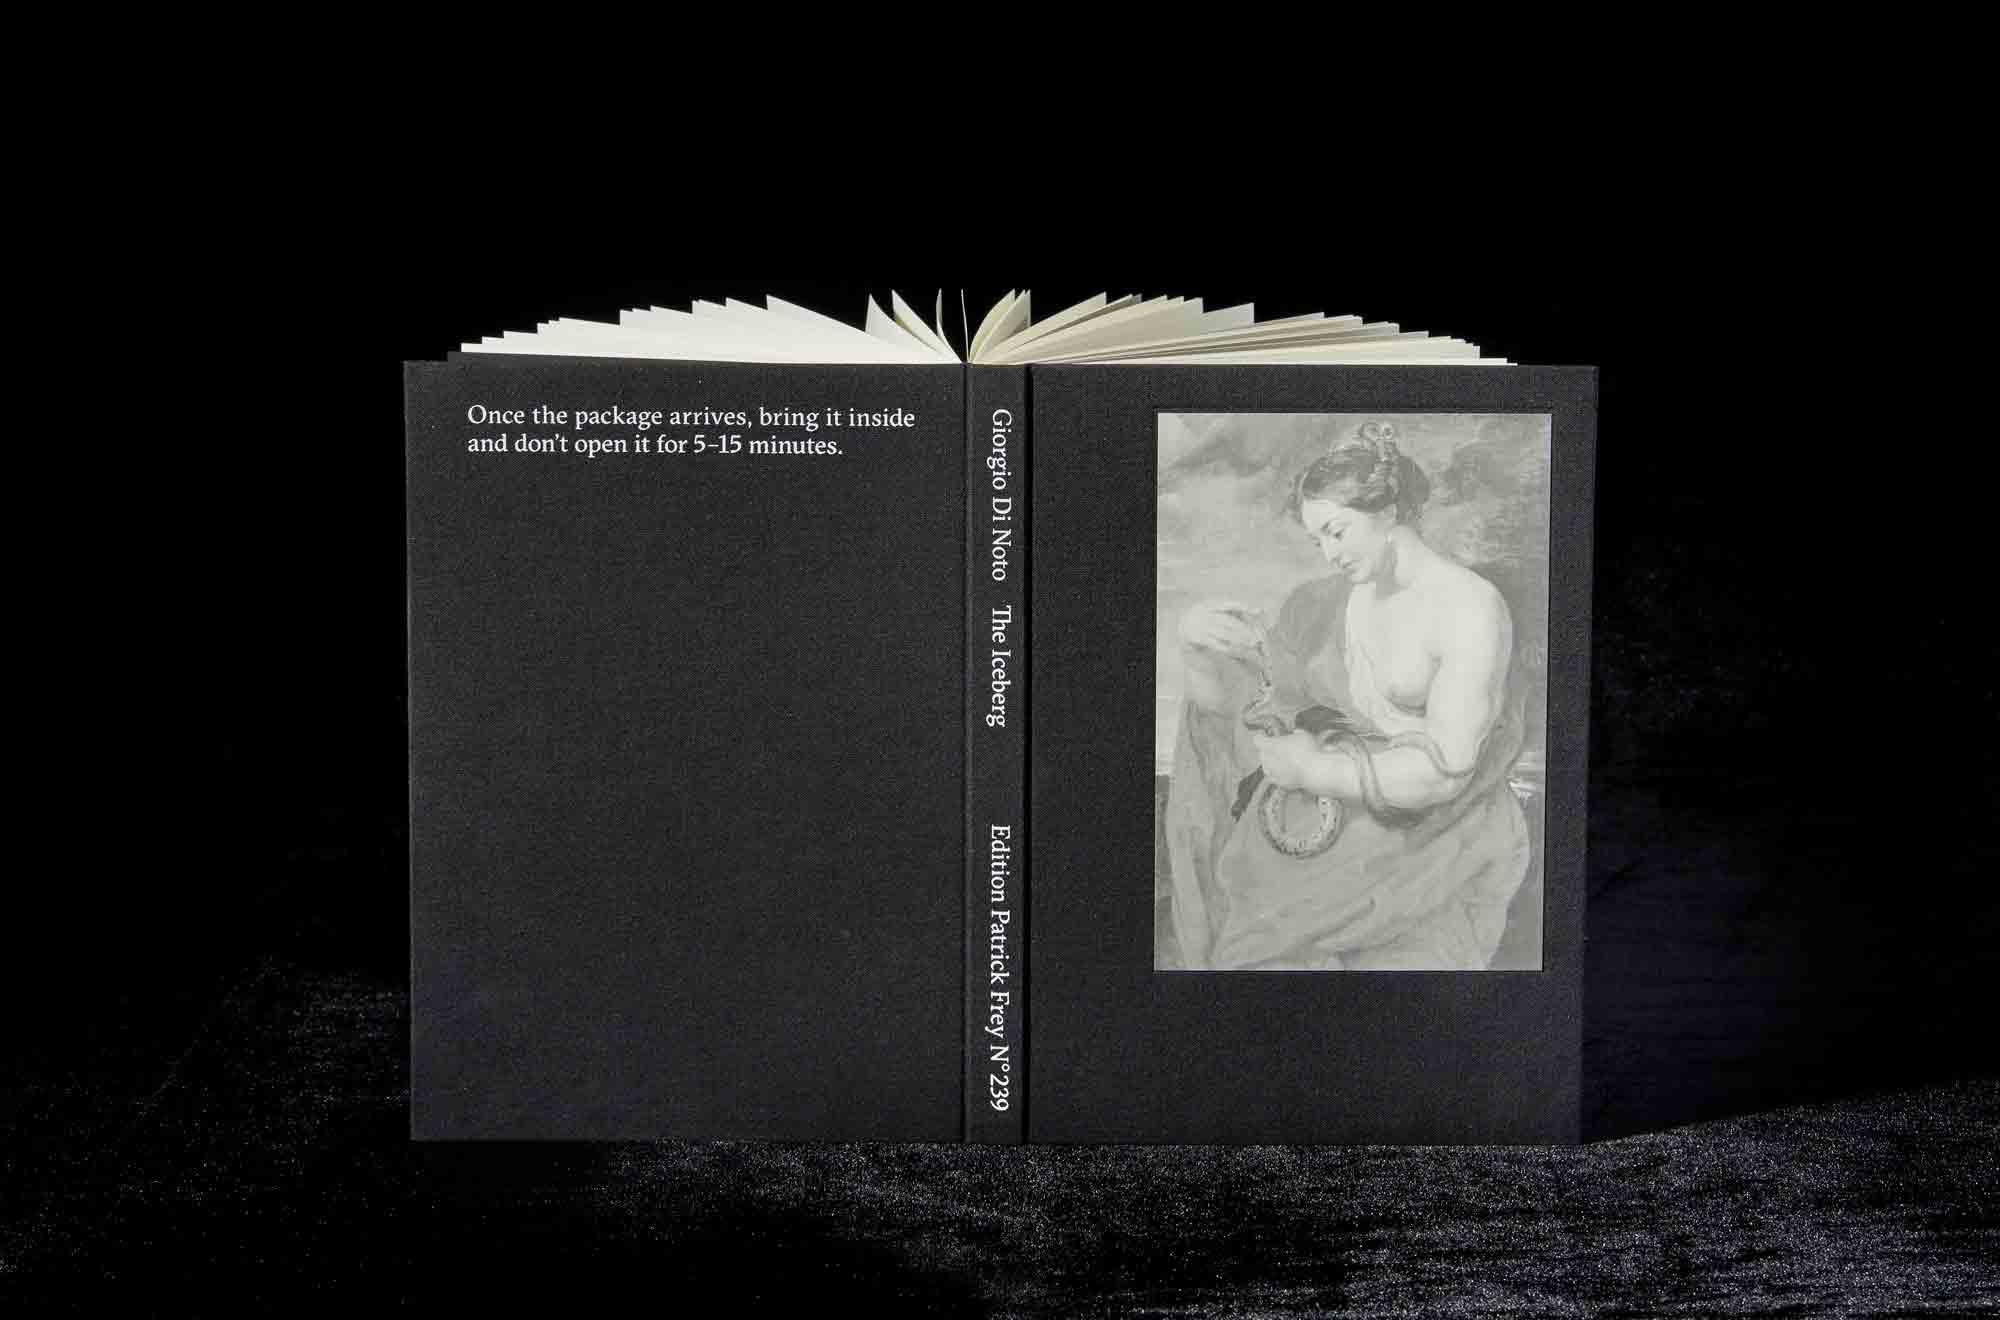 SPECIAL MENTION AUTHOR BOOK AWARD   Giorgio DI NOTO,  The Iceberg , ÉDITION PATRICK FREY, Zürich (Switzerland)